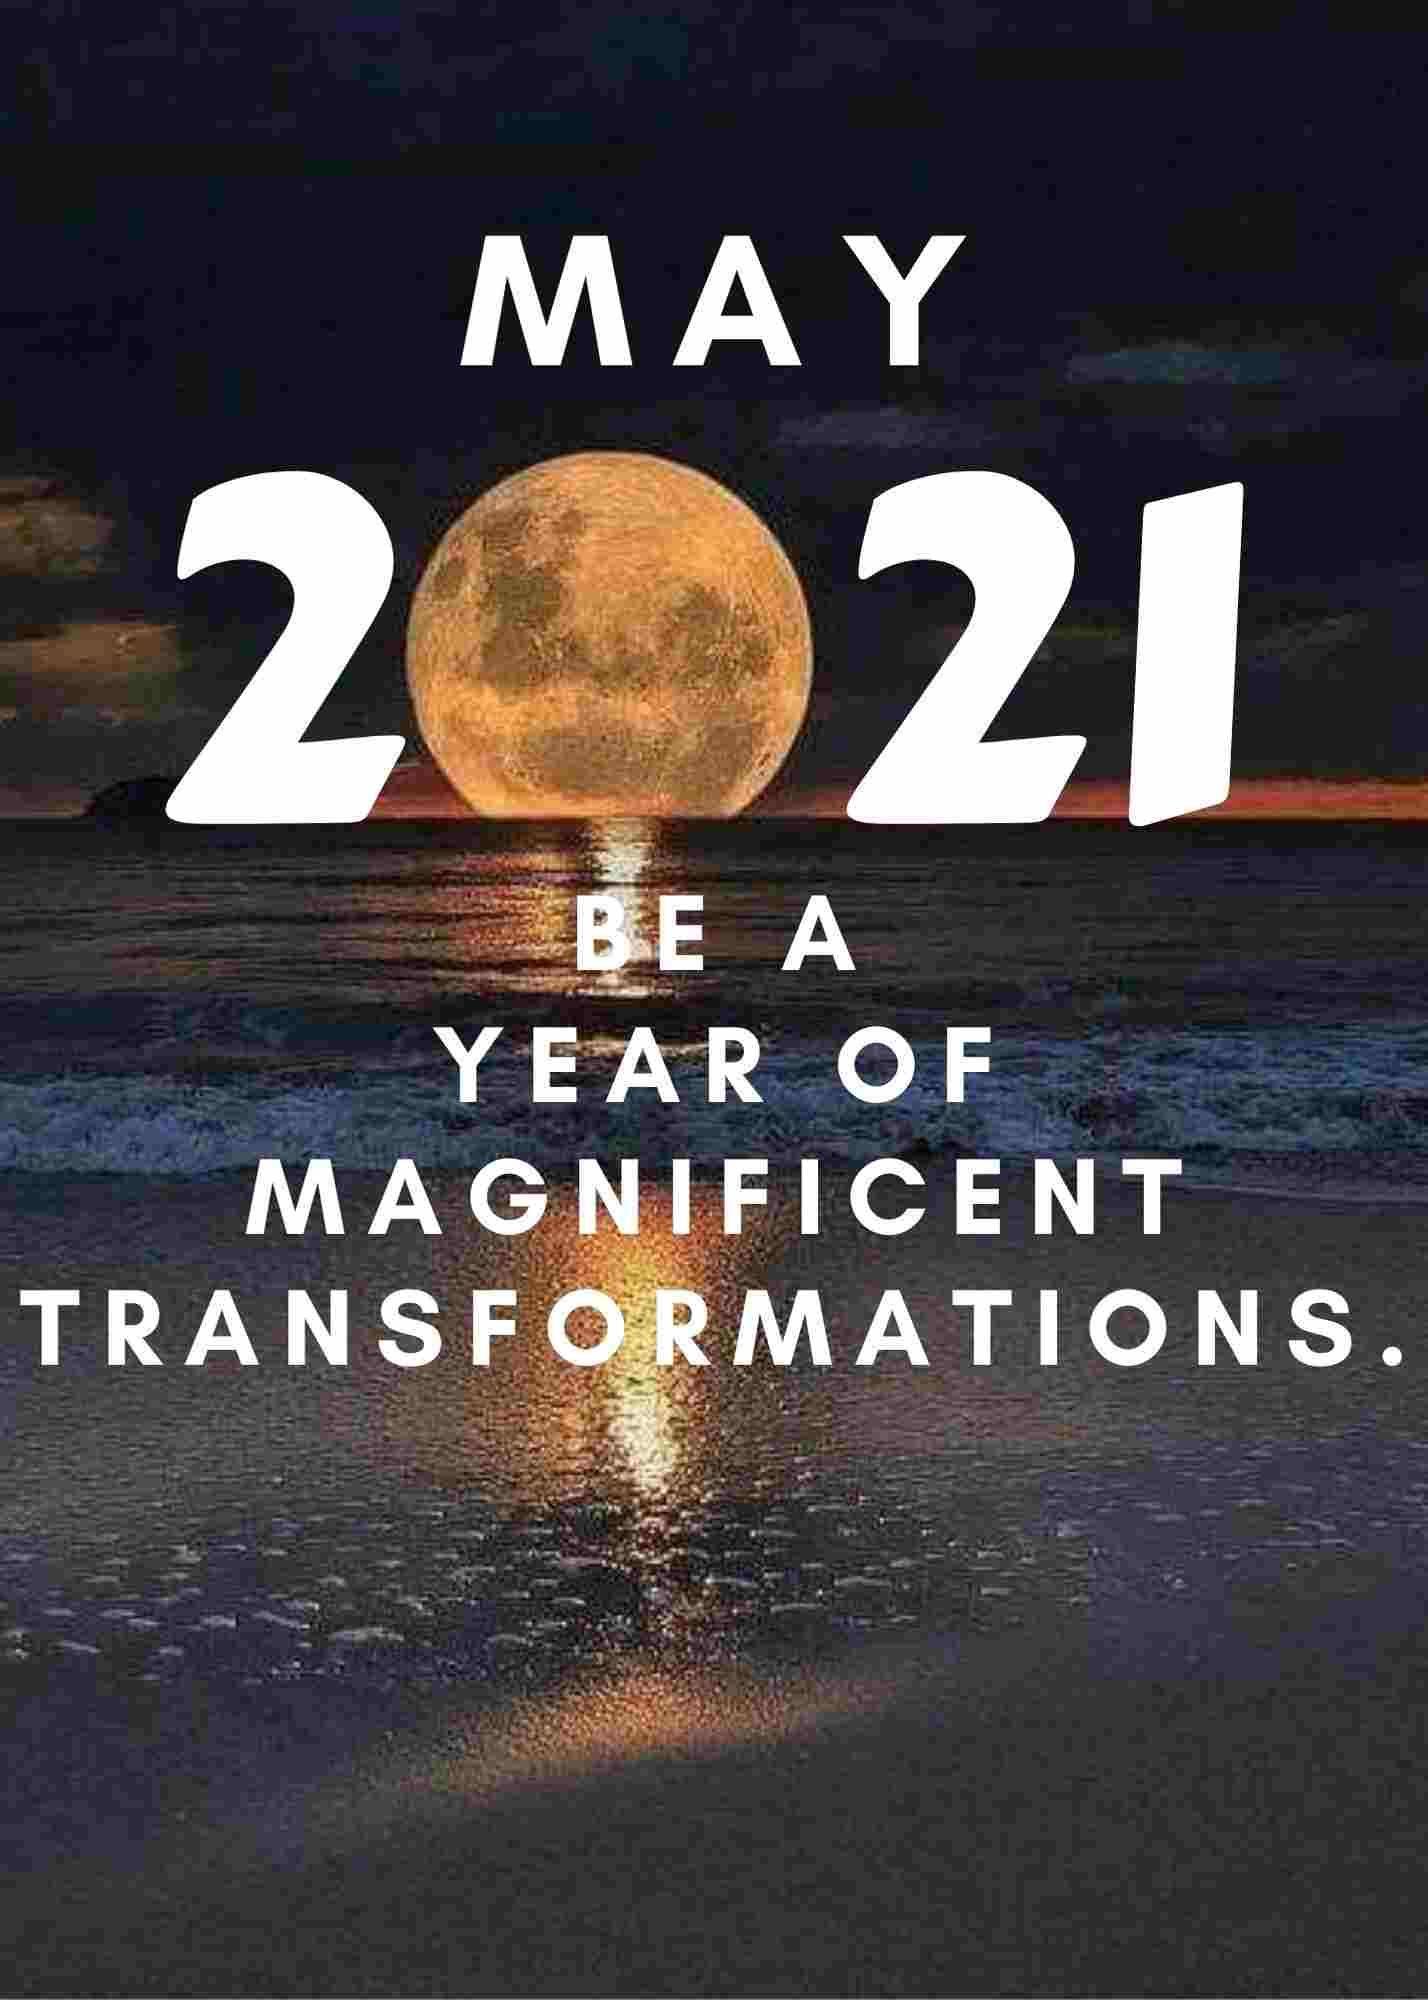 Happy new year 2021 photos in 2020 Happy new year photo